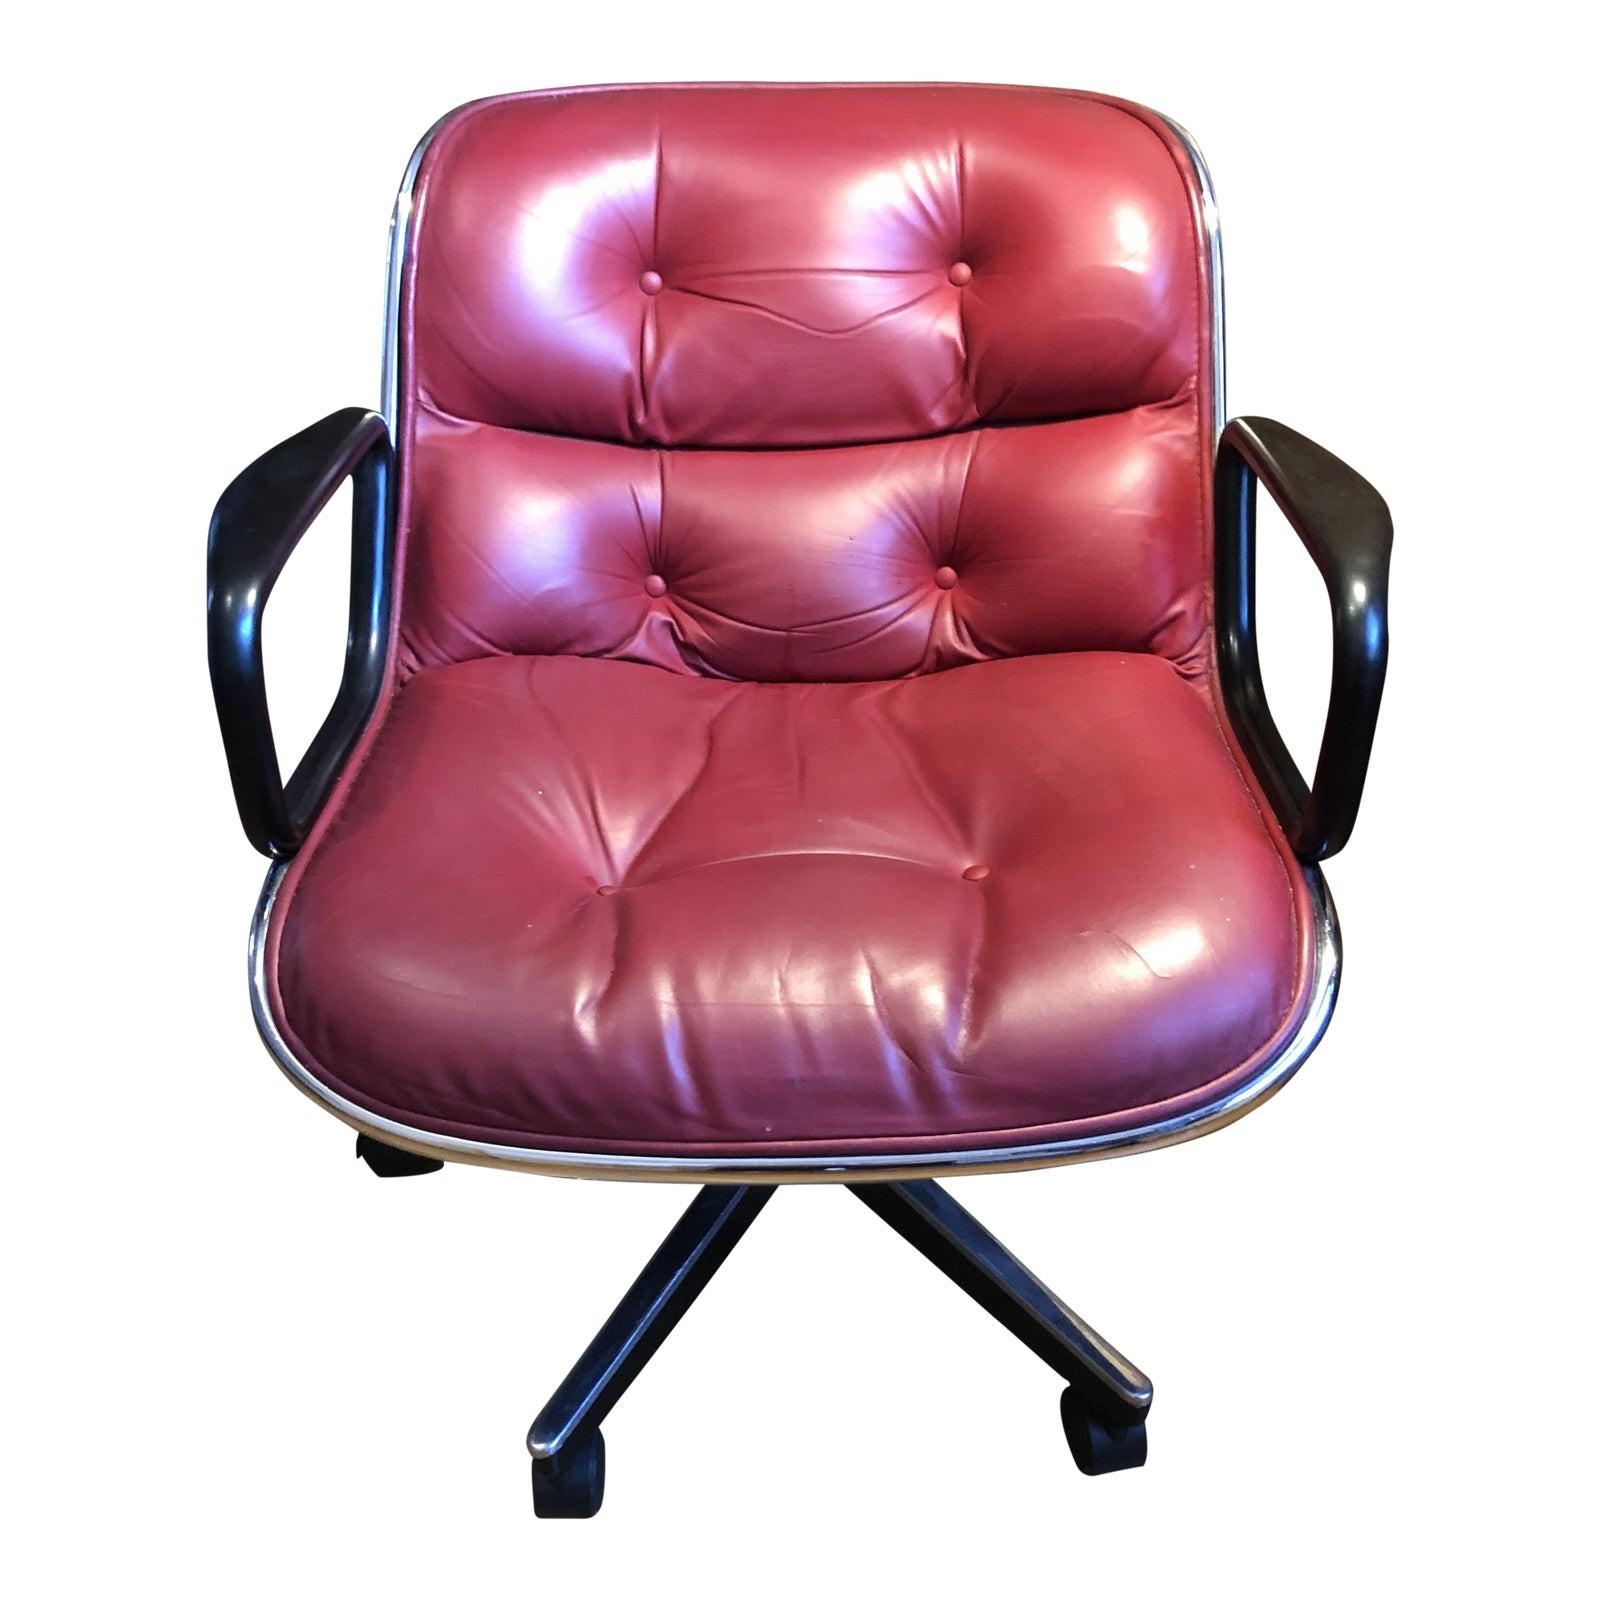 1960s Vintage Pollock Executive Chair